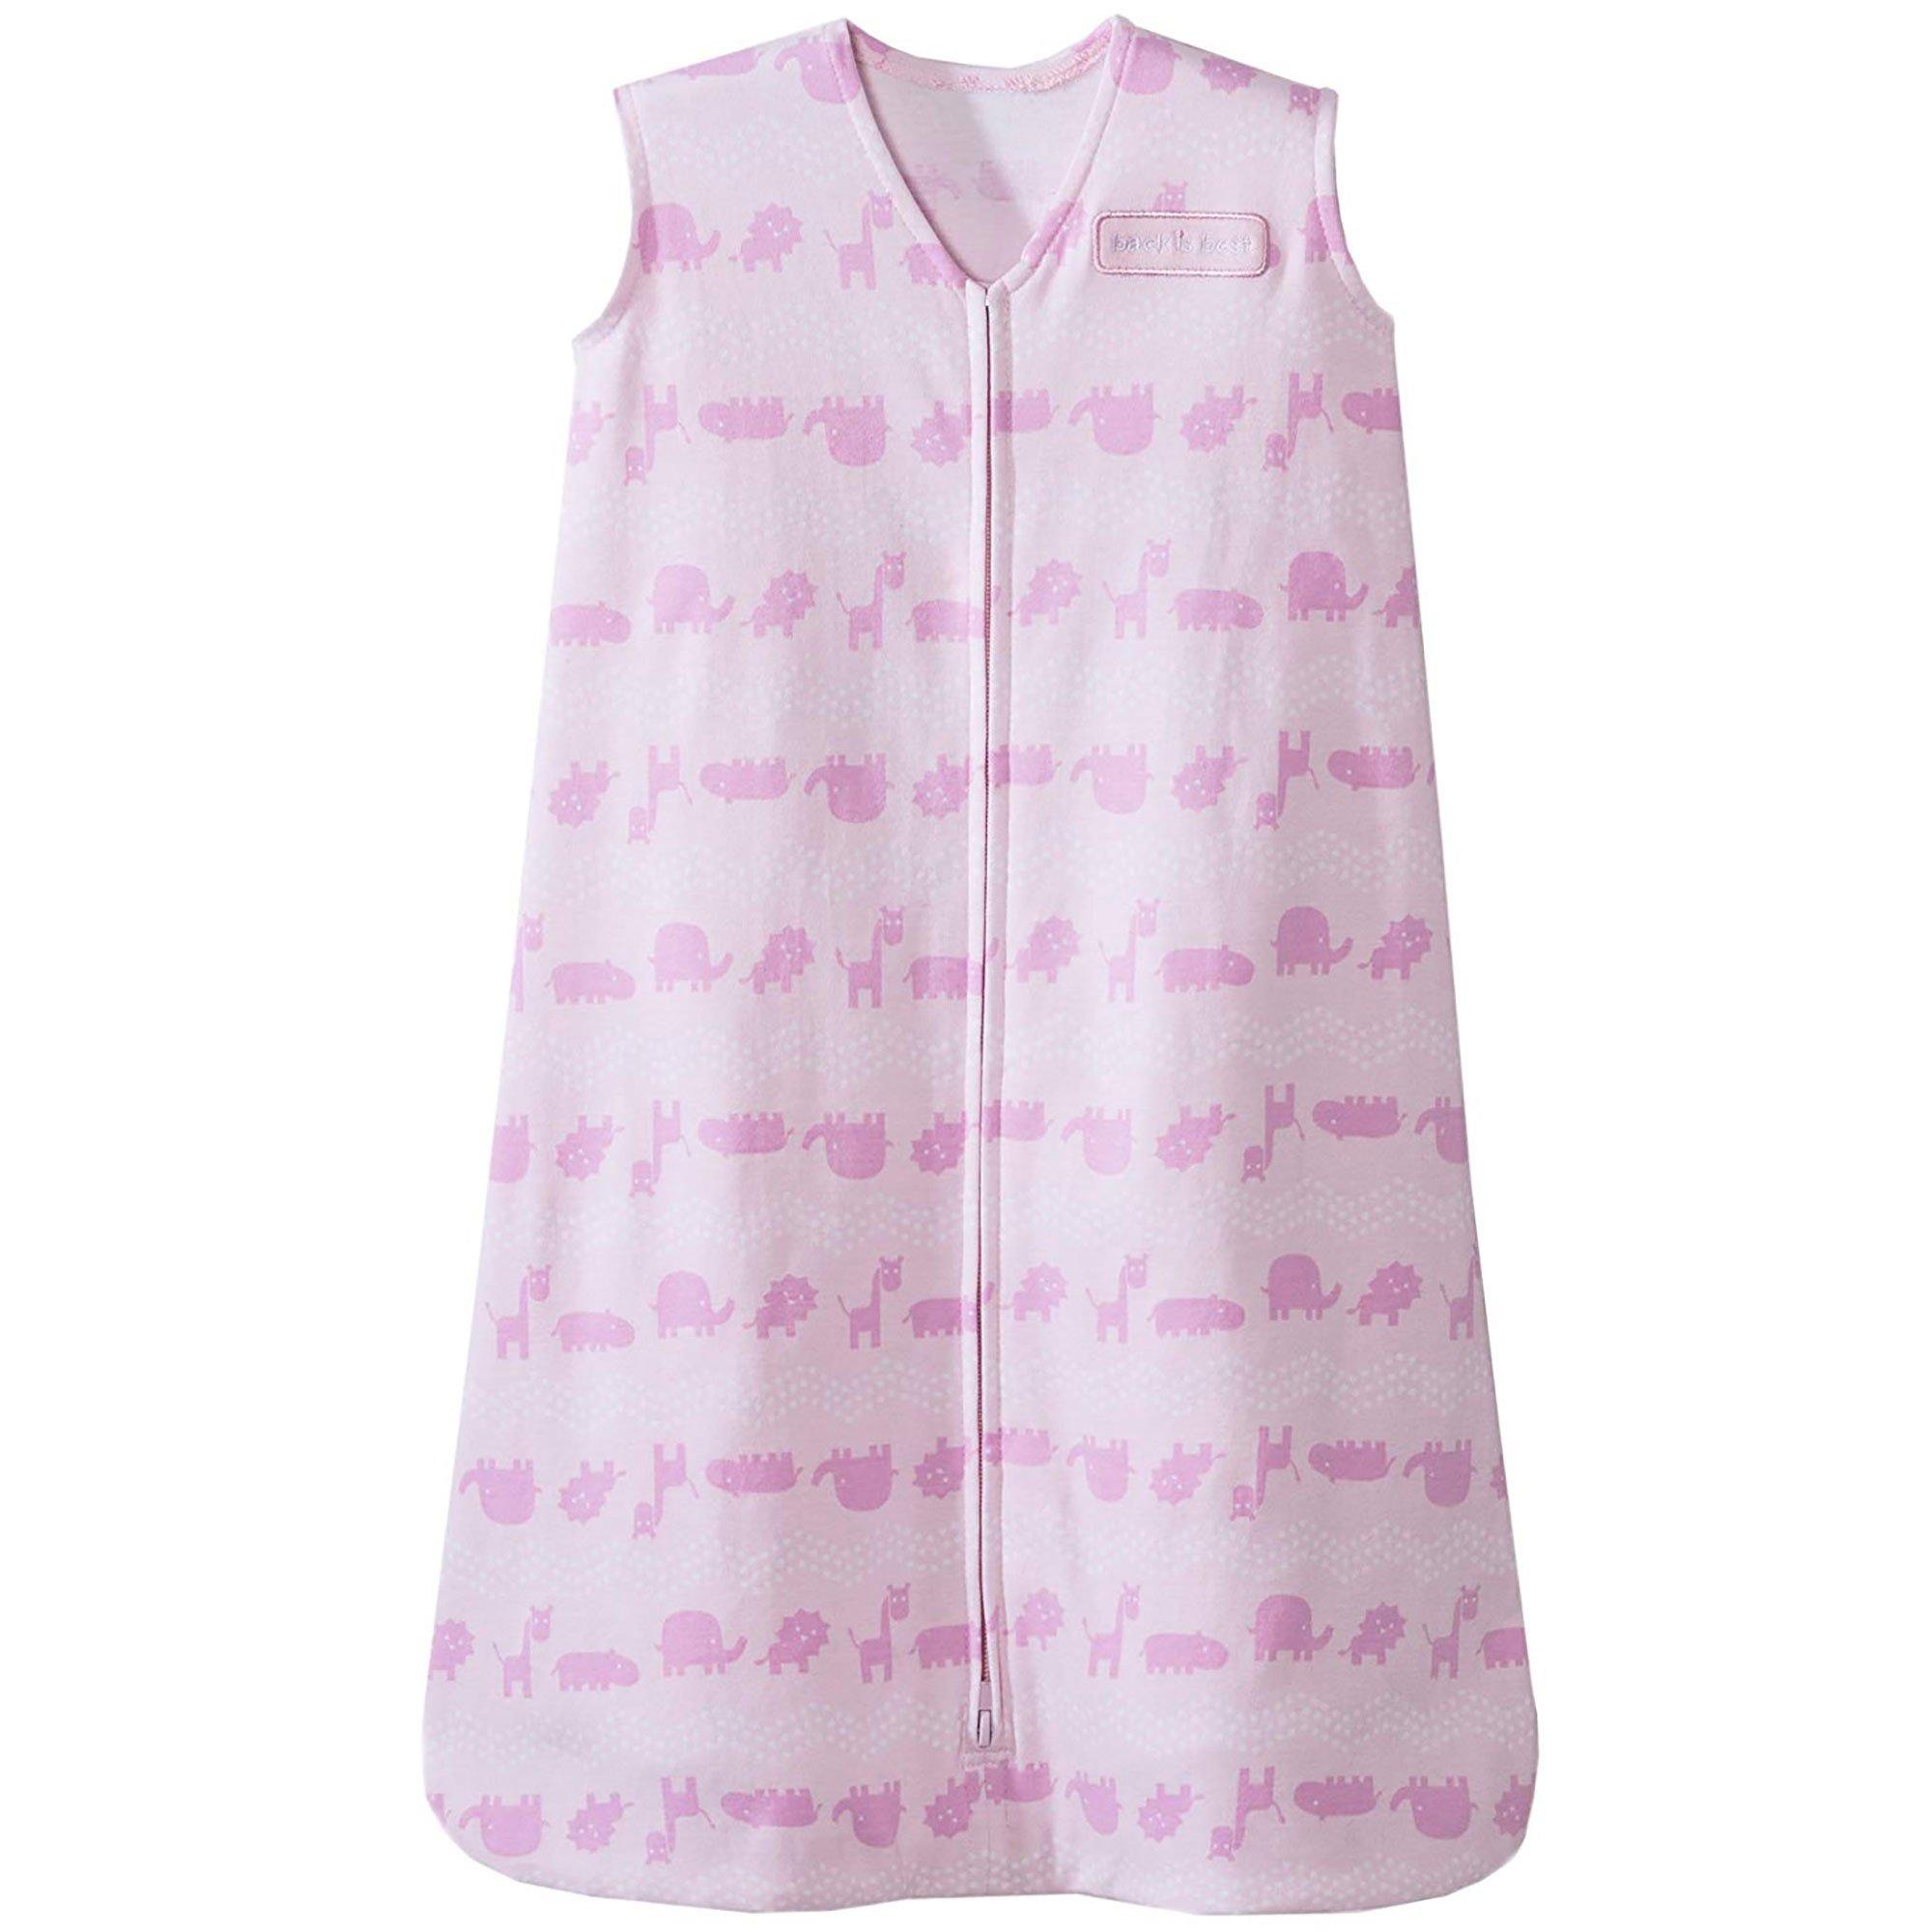 Halo Sleepsack Cotton Wearable Blanket, Pink Jungle Animal, Medium